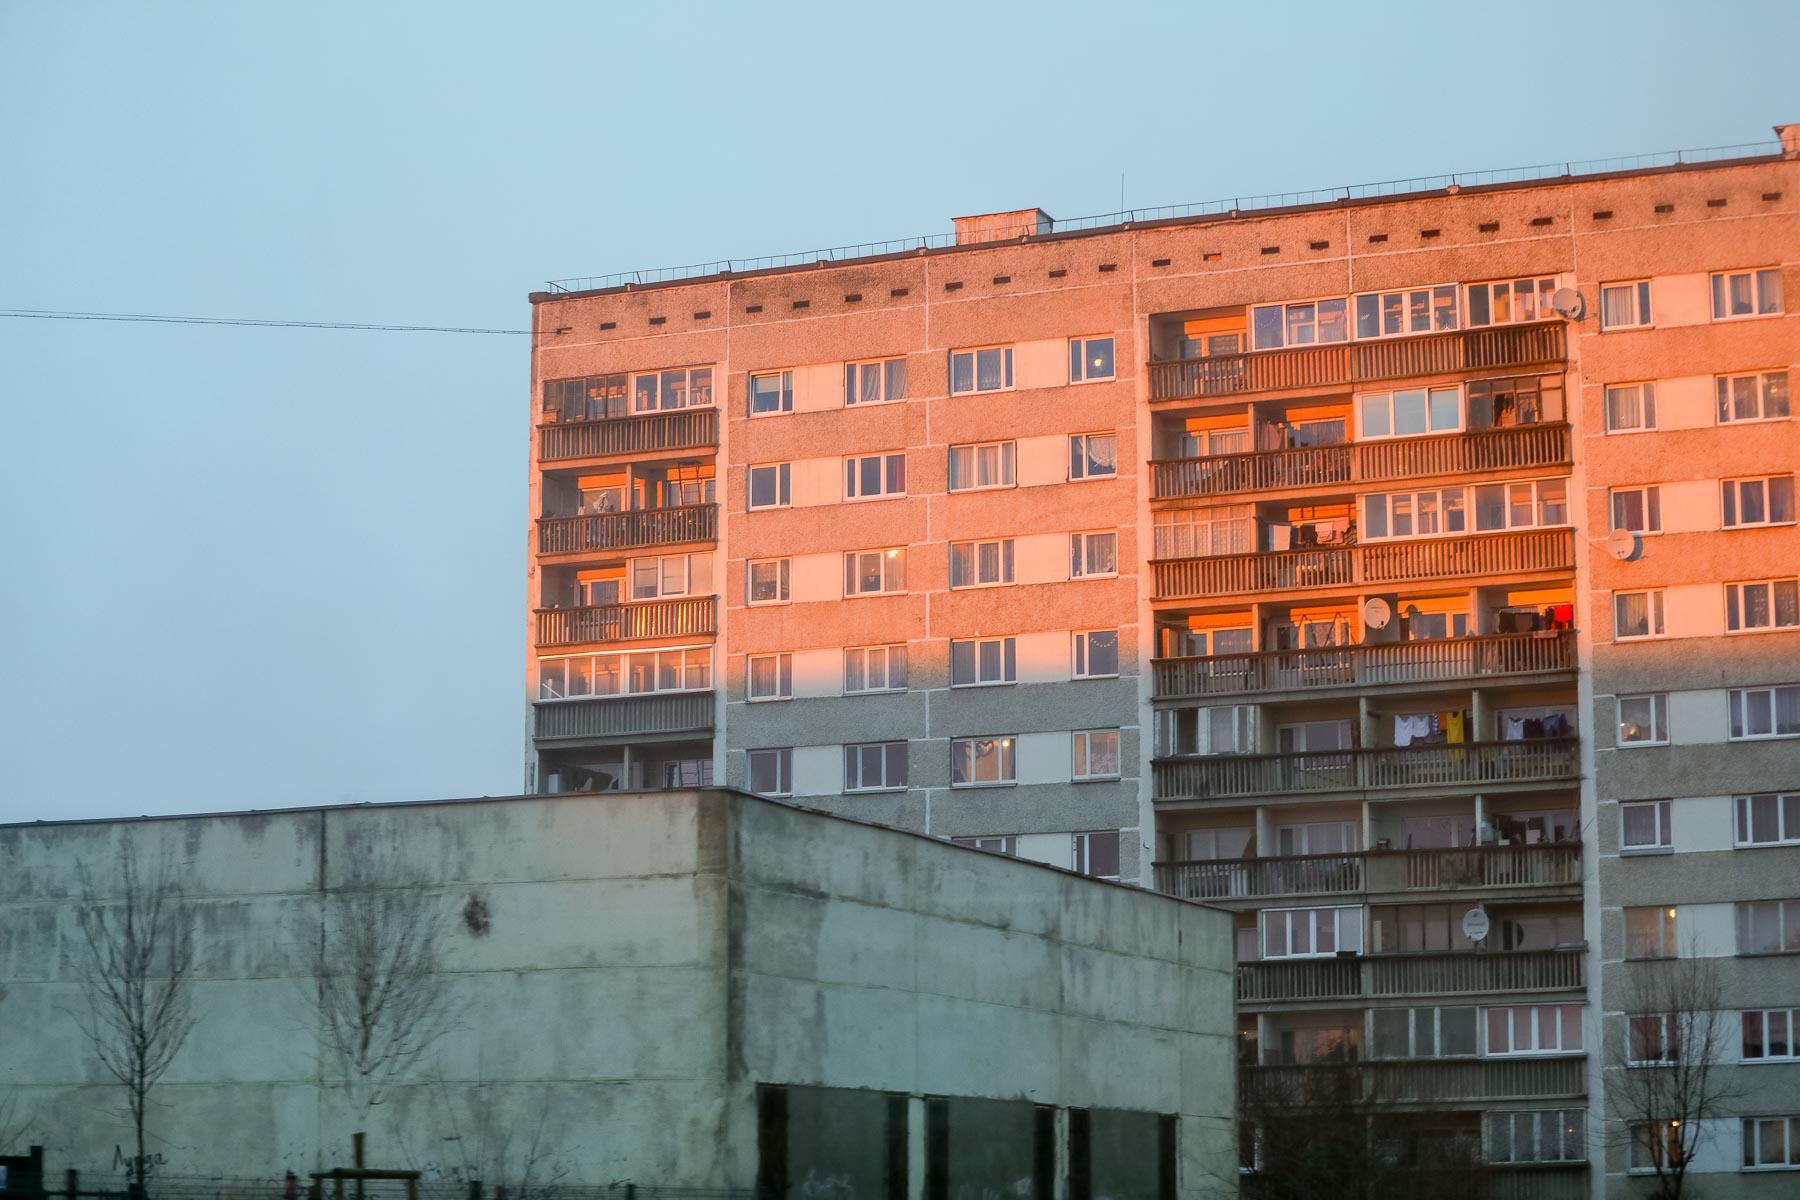 Landscape-cityscape-photography-jelgava-latvia-blocs-blocks-flat-post-soviet--Советские-квартиры-спальный-район-Латвия-город-фотограф-natalia-smith-photography-0081.jpg